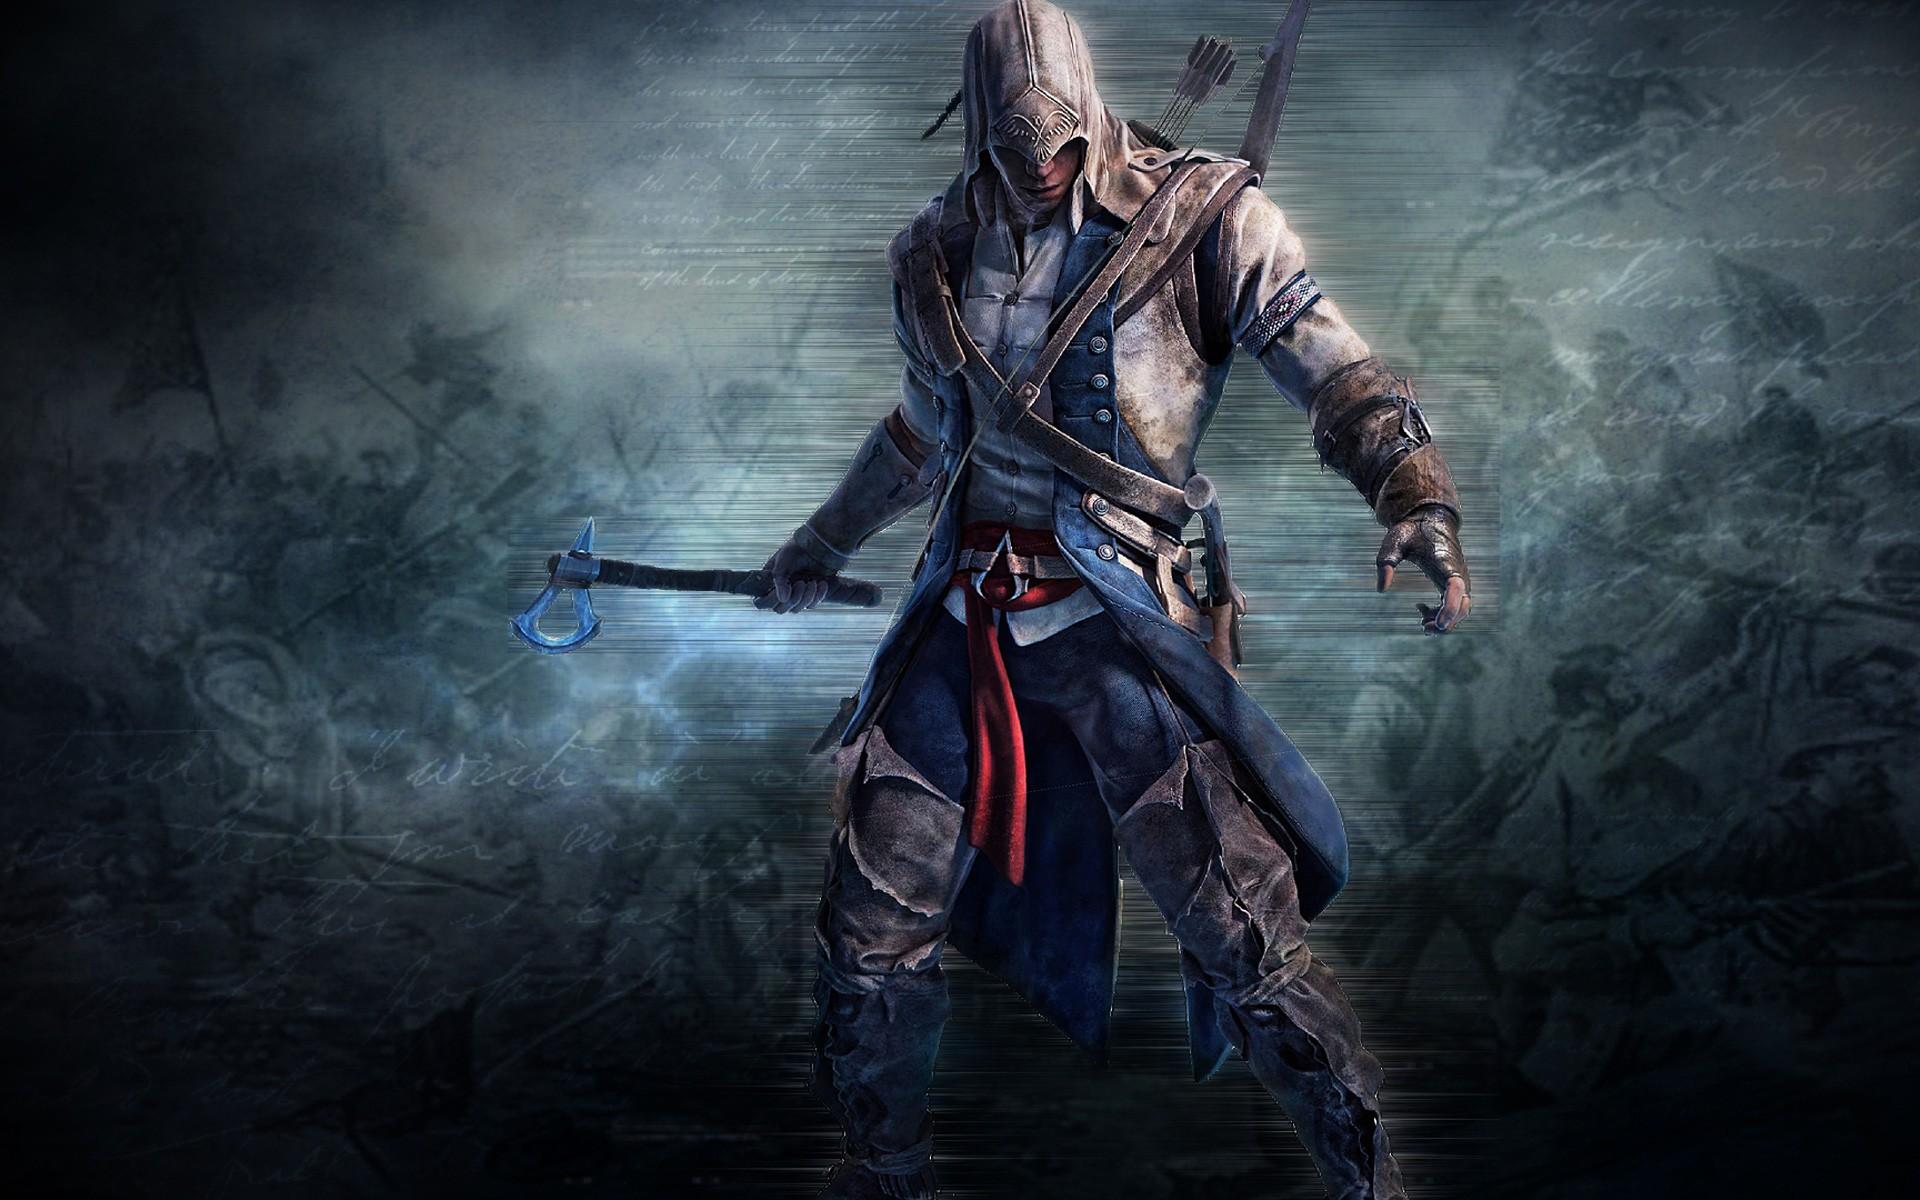 Assassins Creed Assassins Creed 3 Connor Kenway Wallpaper